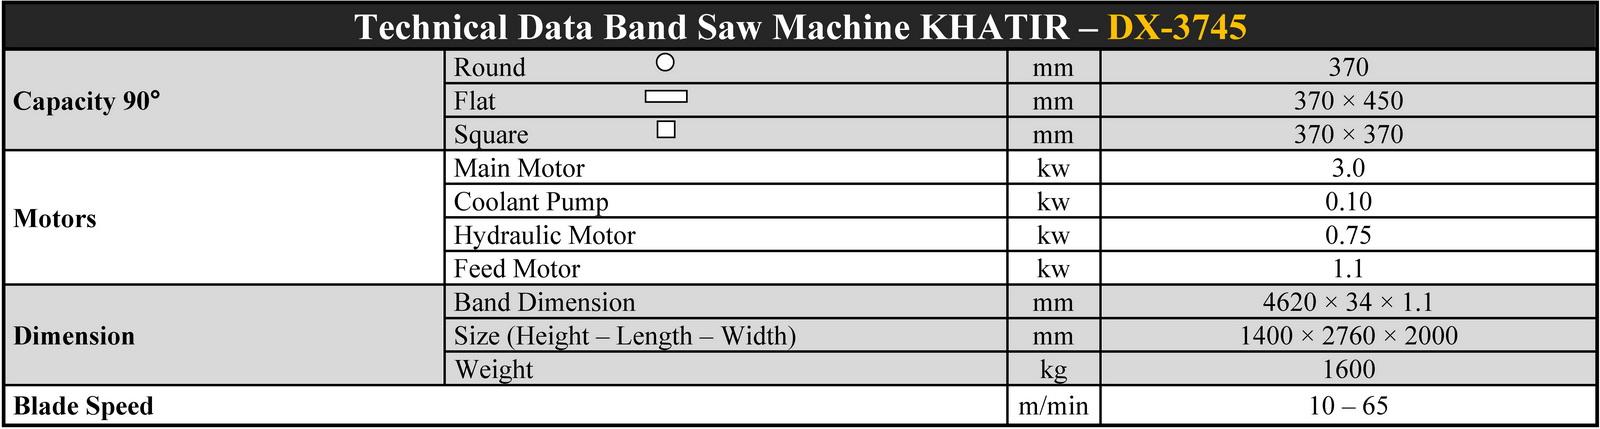 DX 3745 - مشخصات فنی دستگاه اره نواری دو ستون اتوماتیک خطیر